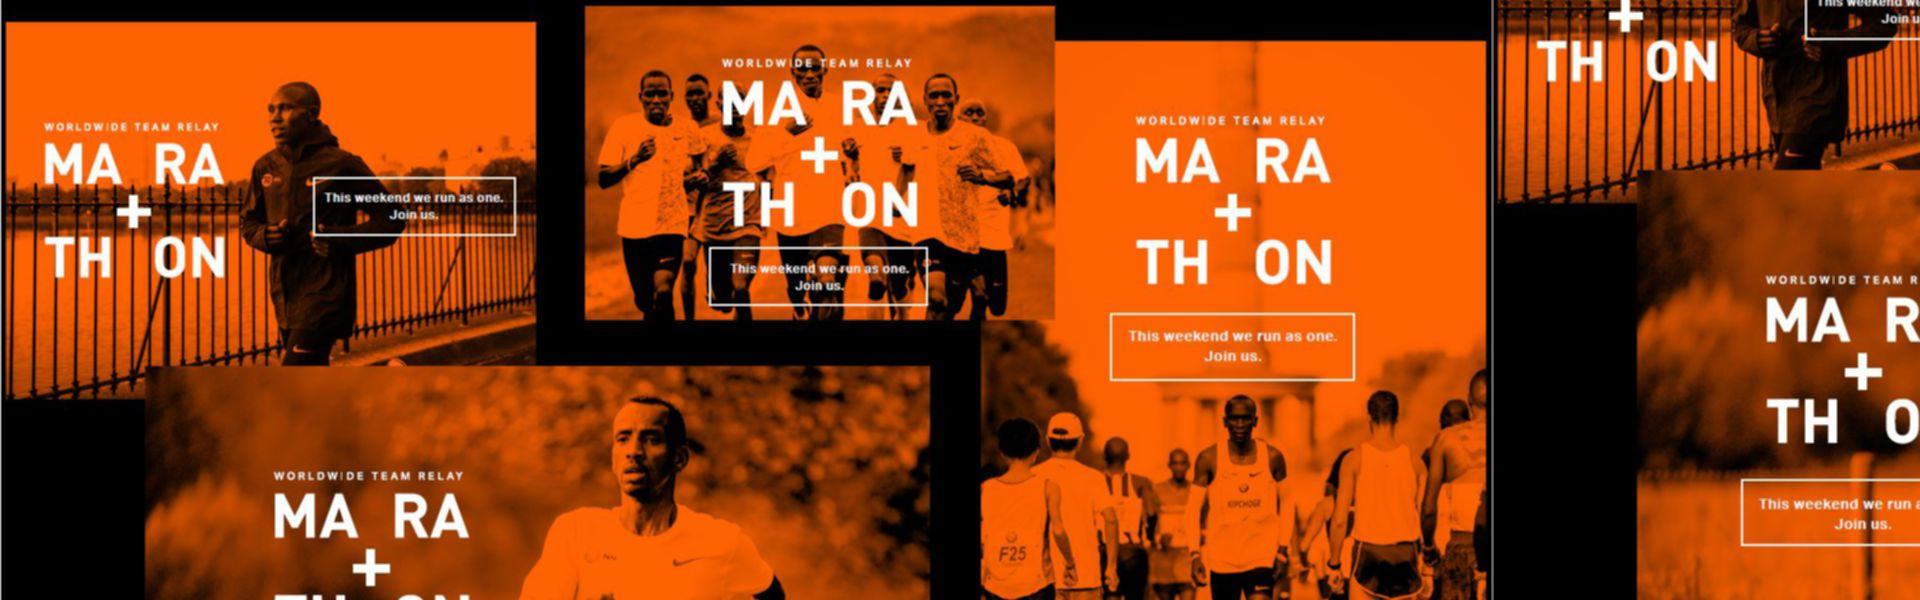 Hétvégén startol a globális virtuális maratonváltó, a MA RA TH ON: Run as one